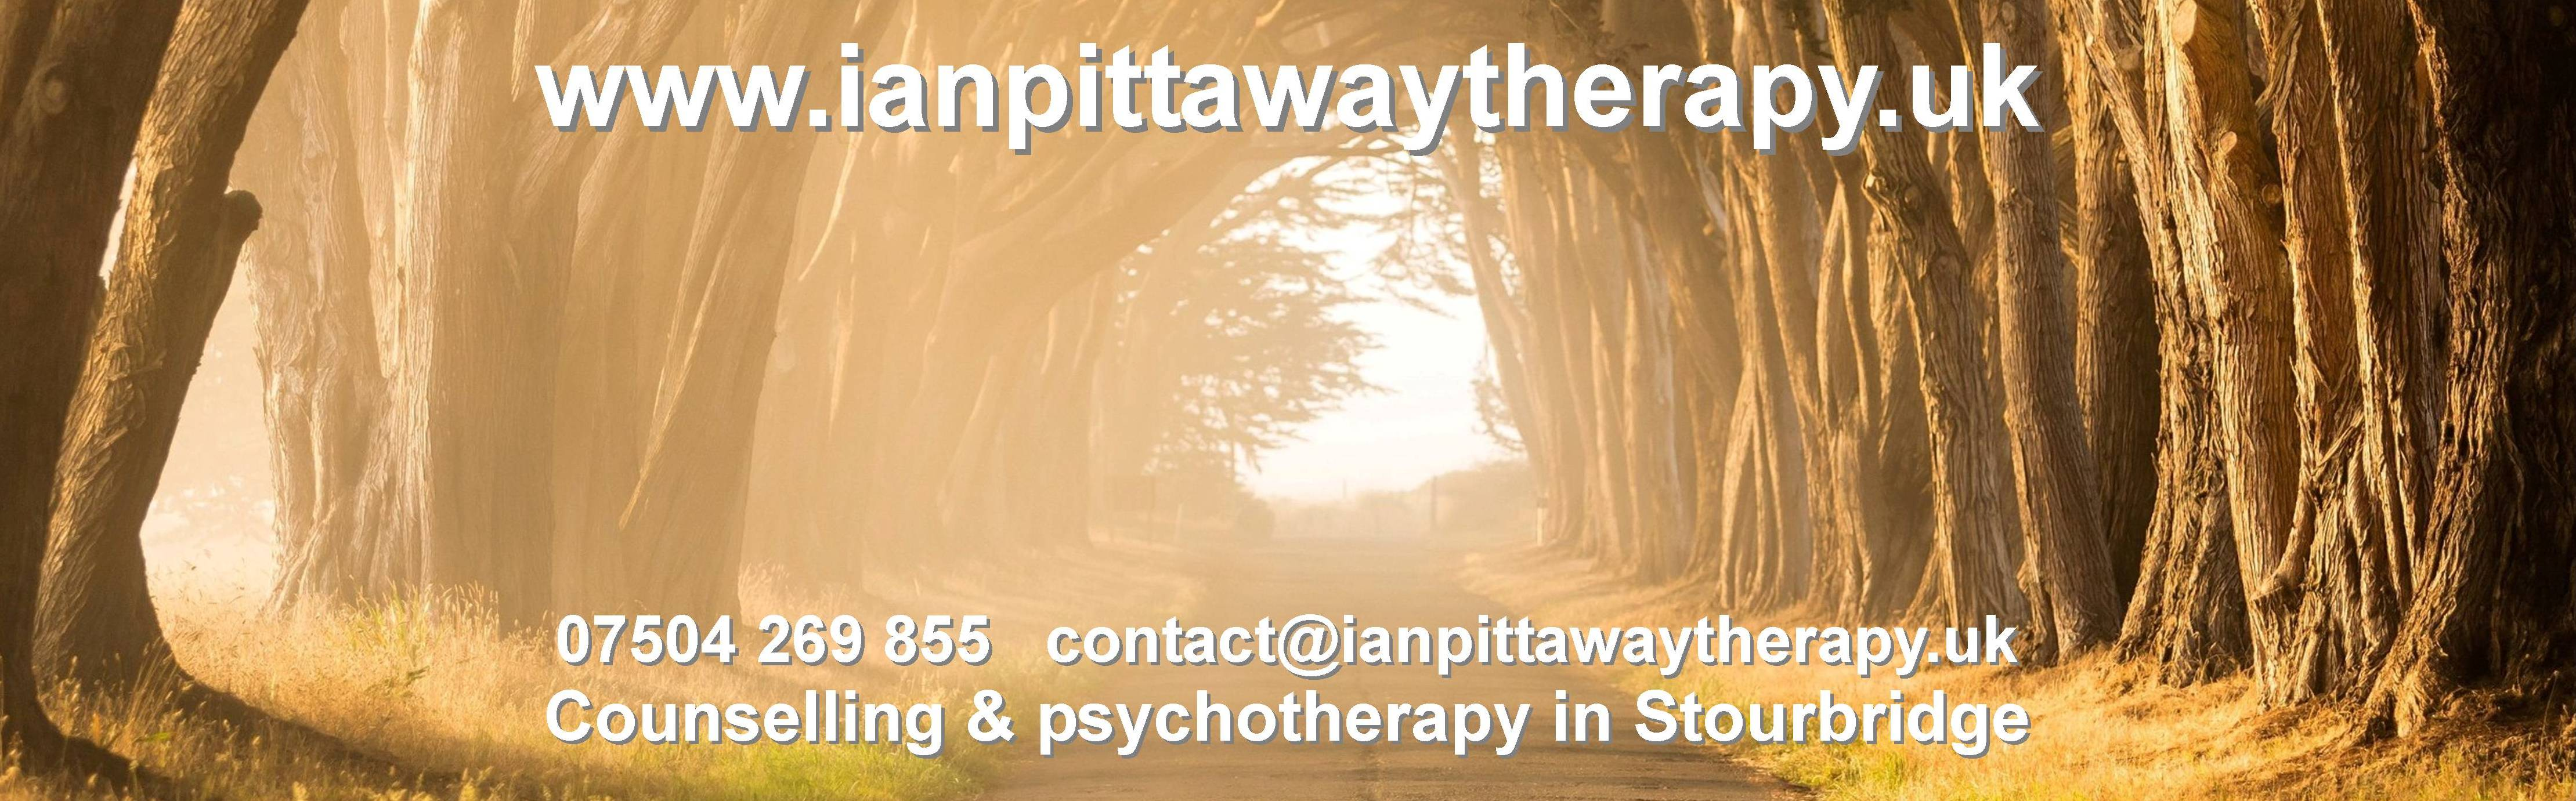 Ian Pittaway Therapy